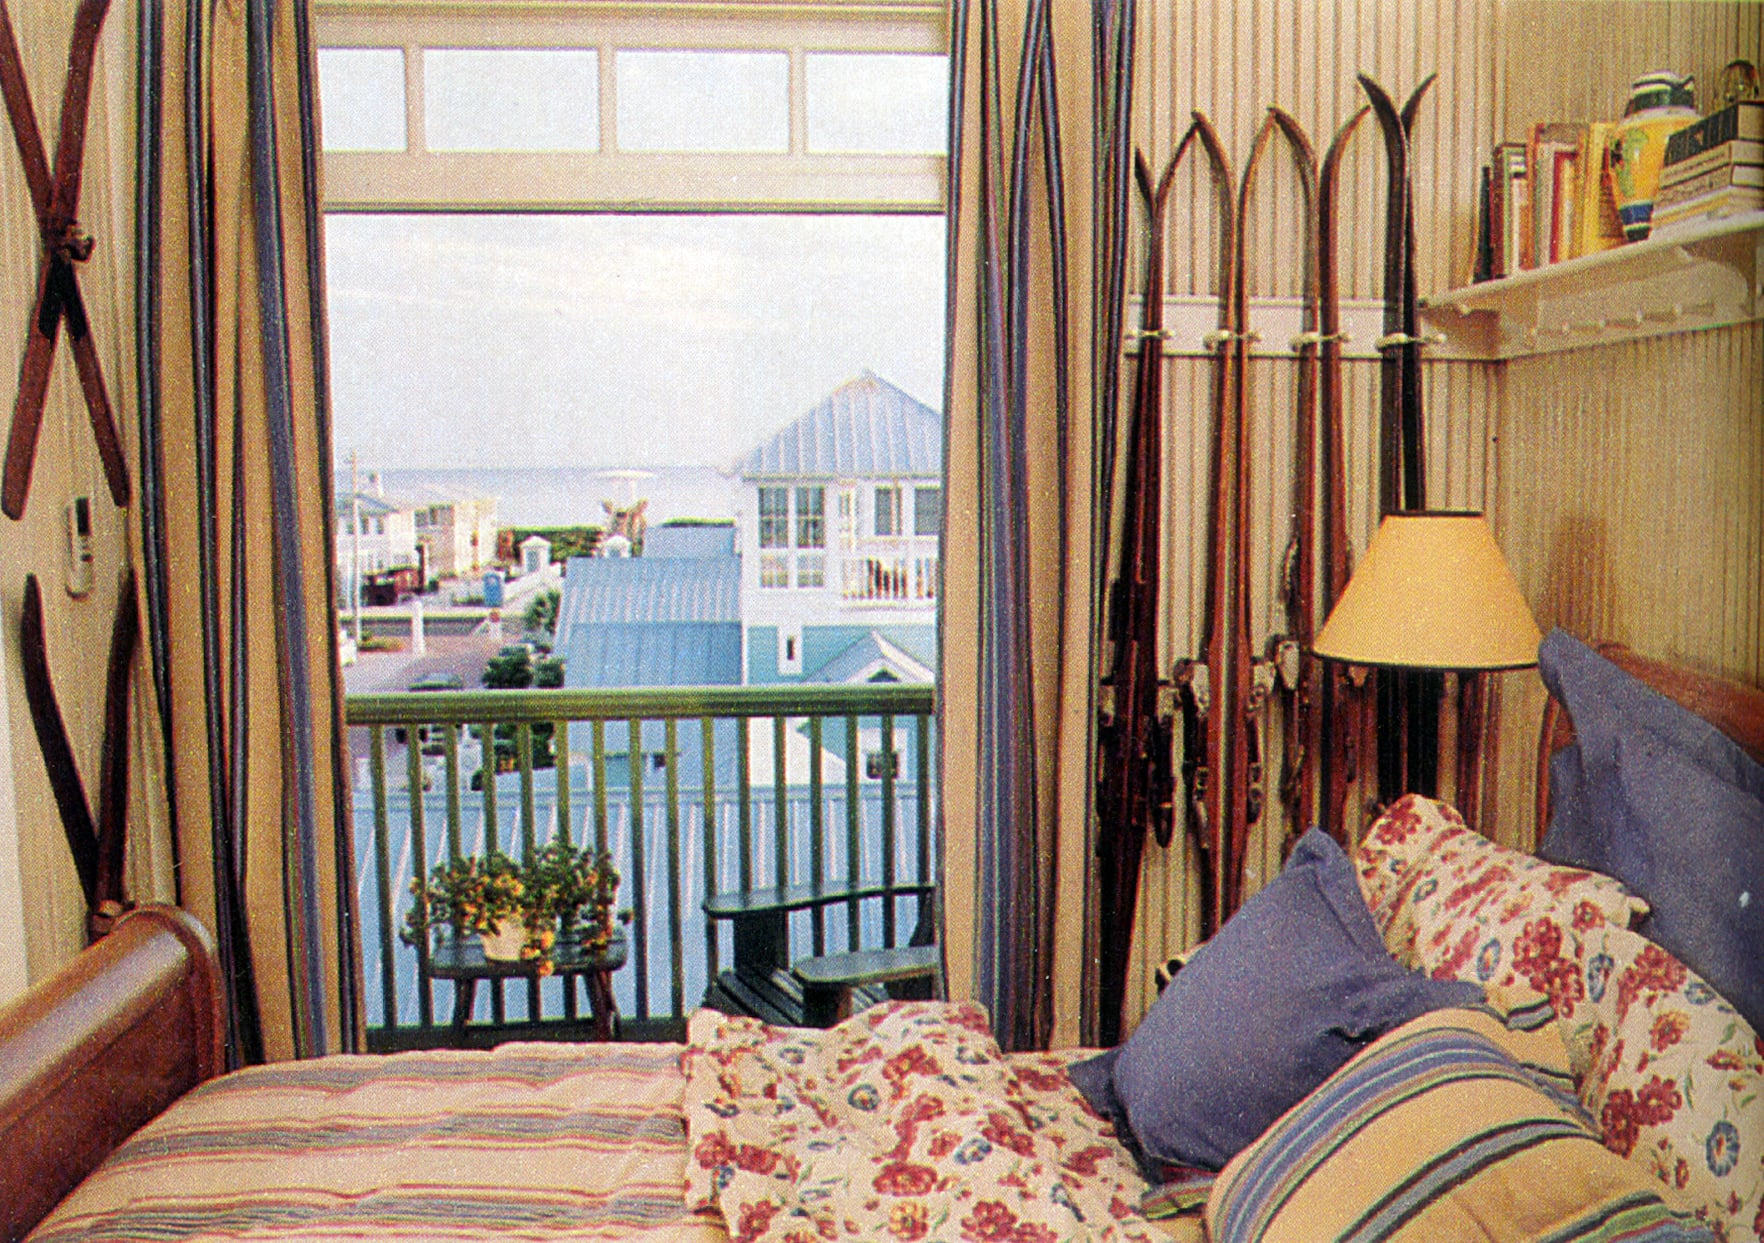 Seaside_Florida.Beach.Natchez_House.New_Urbanism.CNU.Courtyard.Walkable.Robert_Orr_&_Associates.Architecture.Landscape_Architecture.Urbanism.High_Rustler_View2.jpg